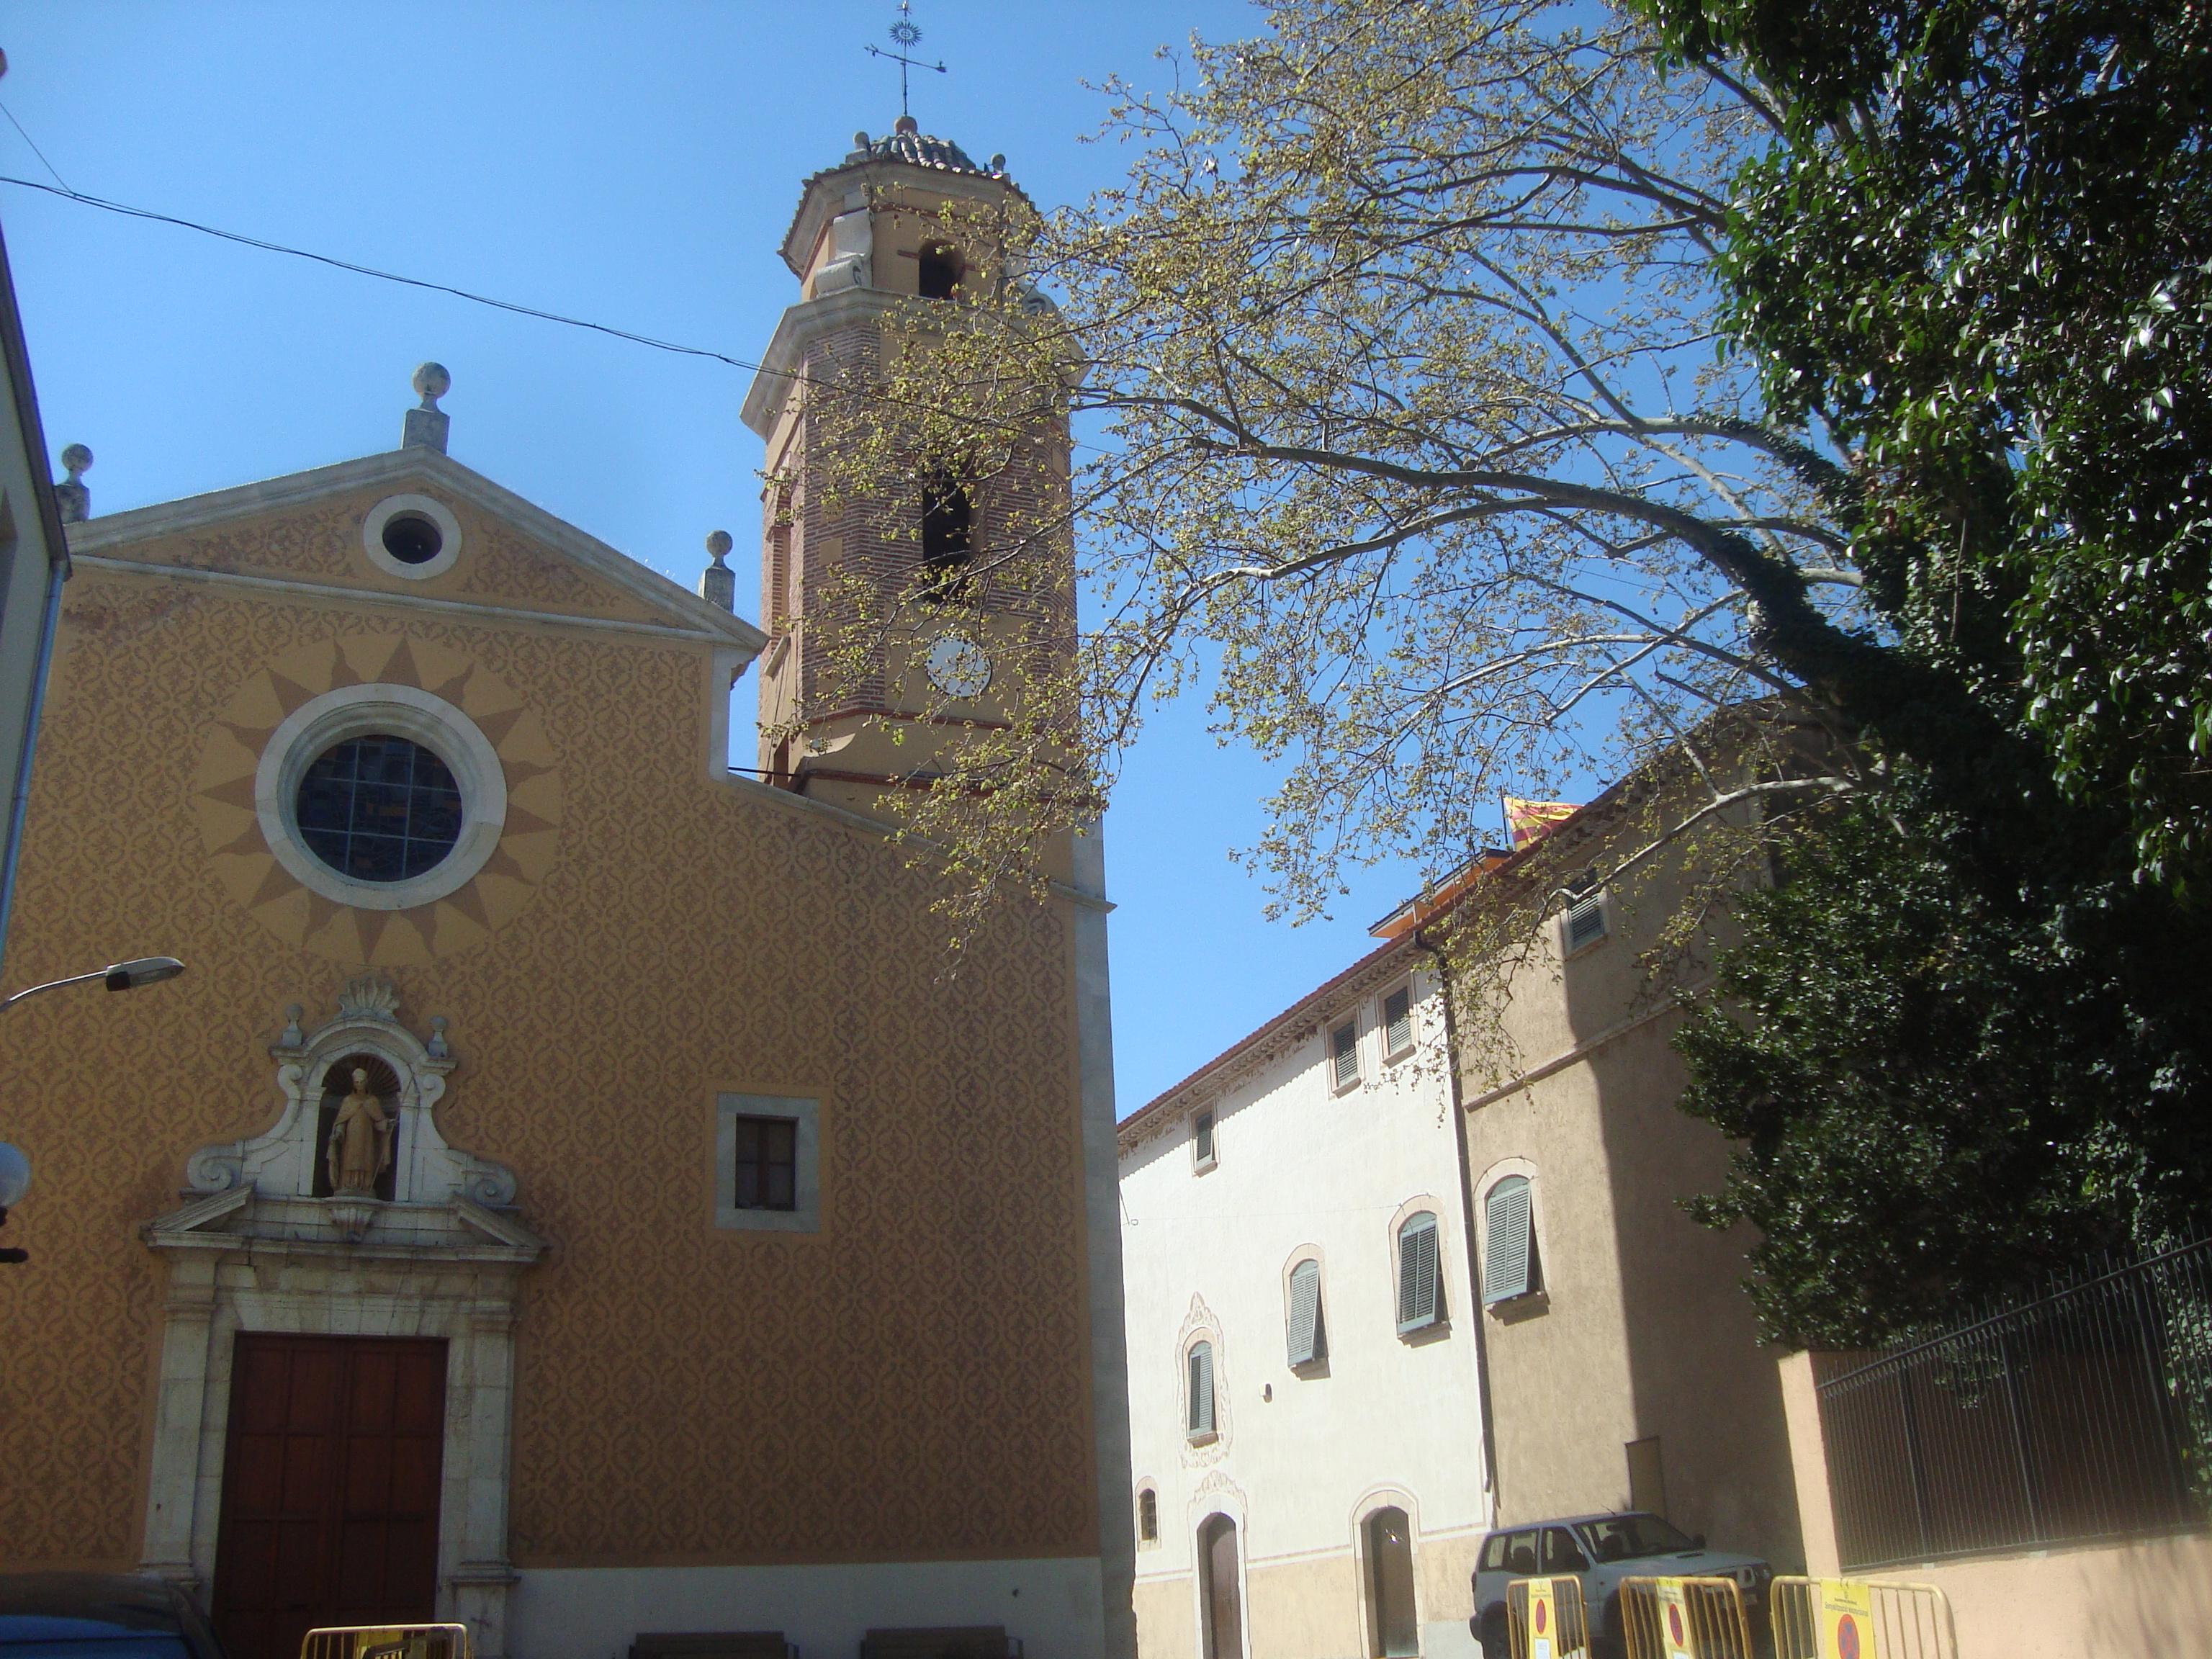 Archivo:Iglesia parroquial de San Martín en El Morell (Tarragona ...